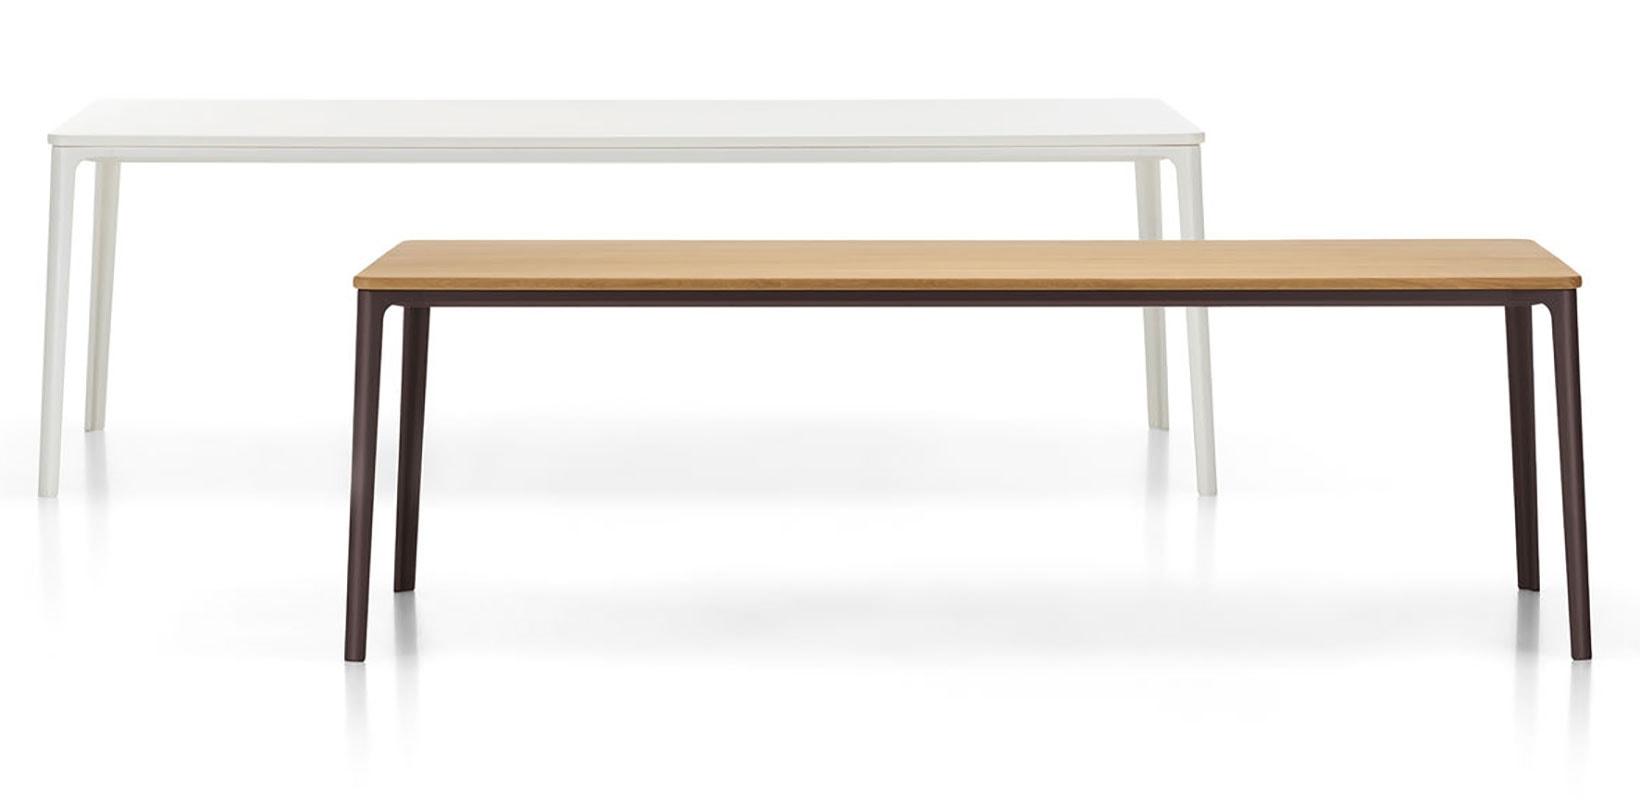 VITRA Plate dining tavolo gallery 1